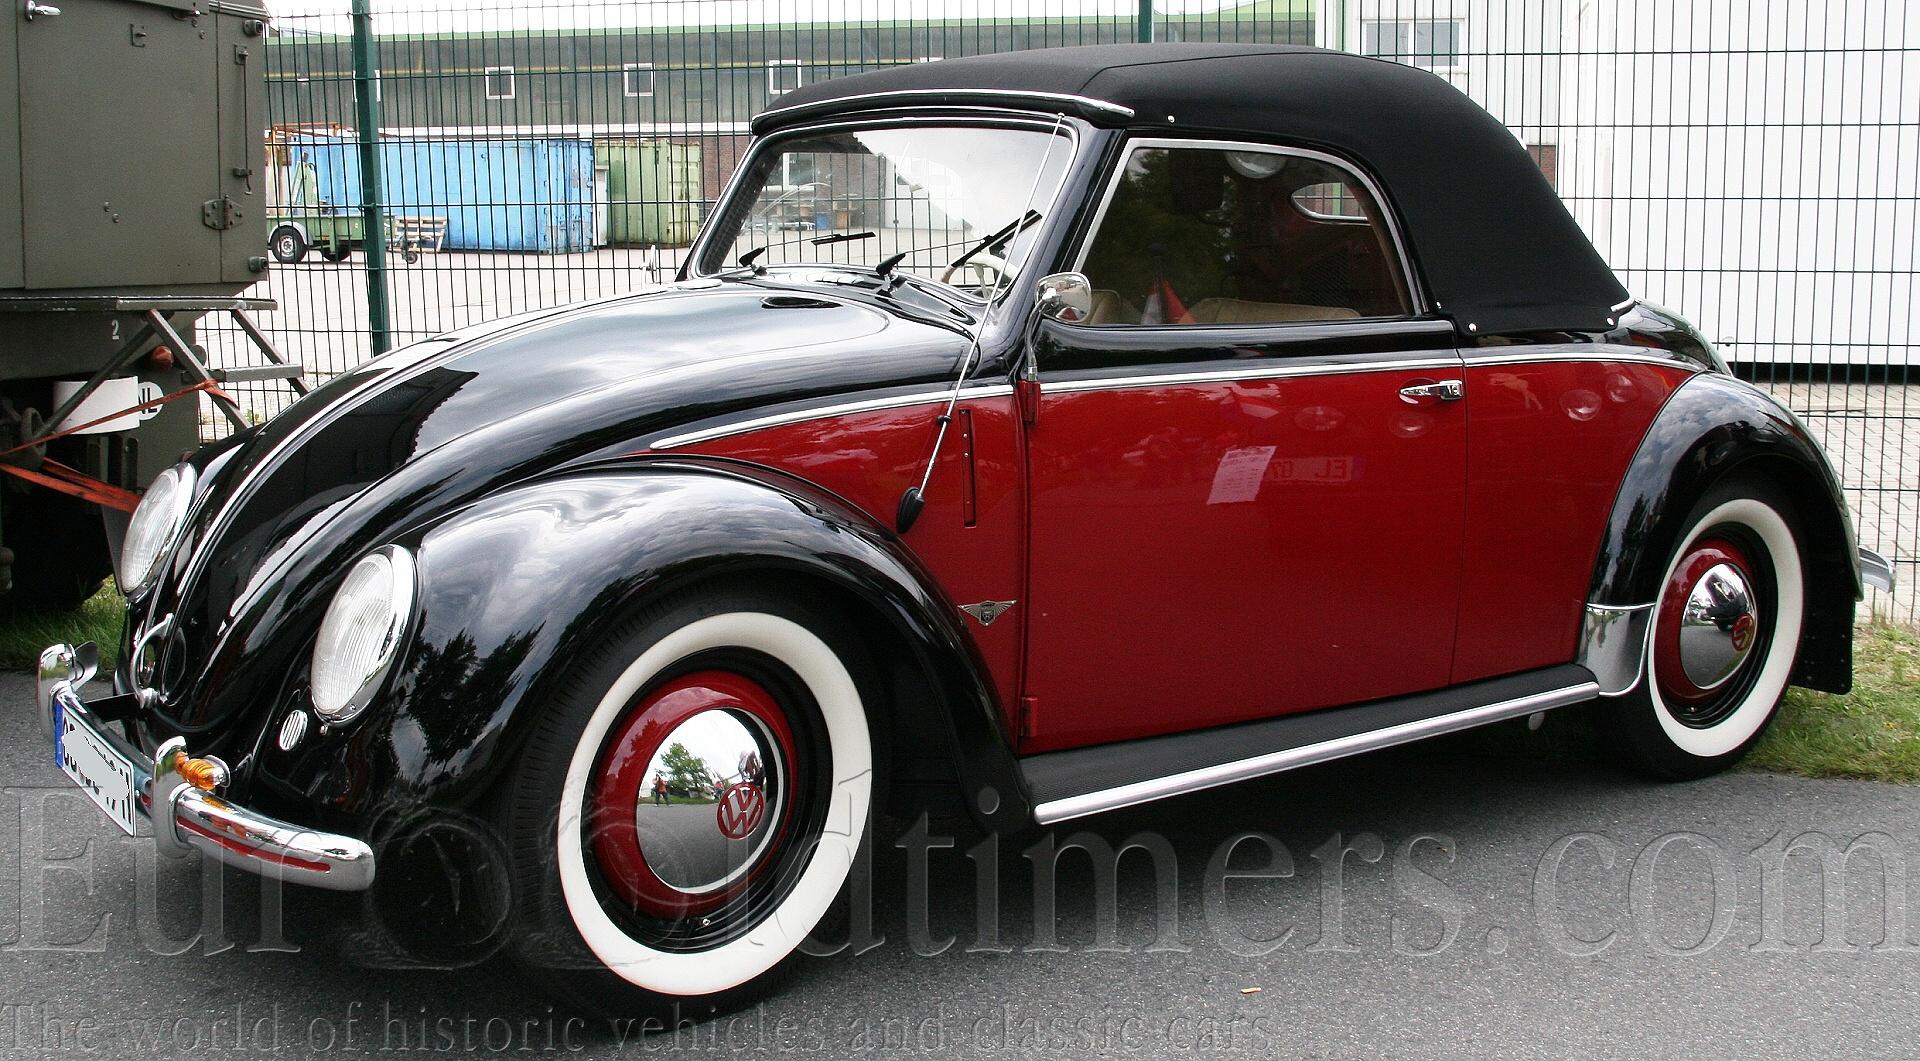 1949 53 Vw Hebm 252 Ller Cabriolet 1131ccm Gallery